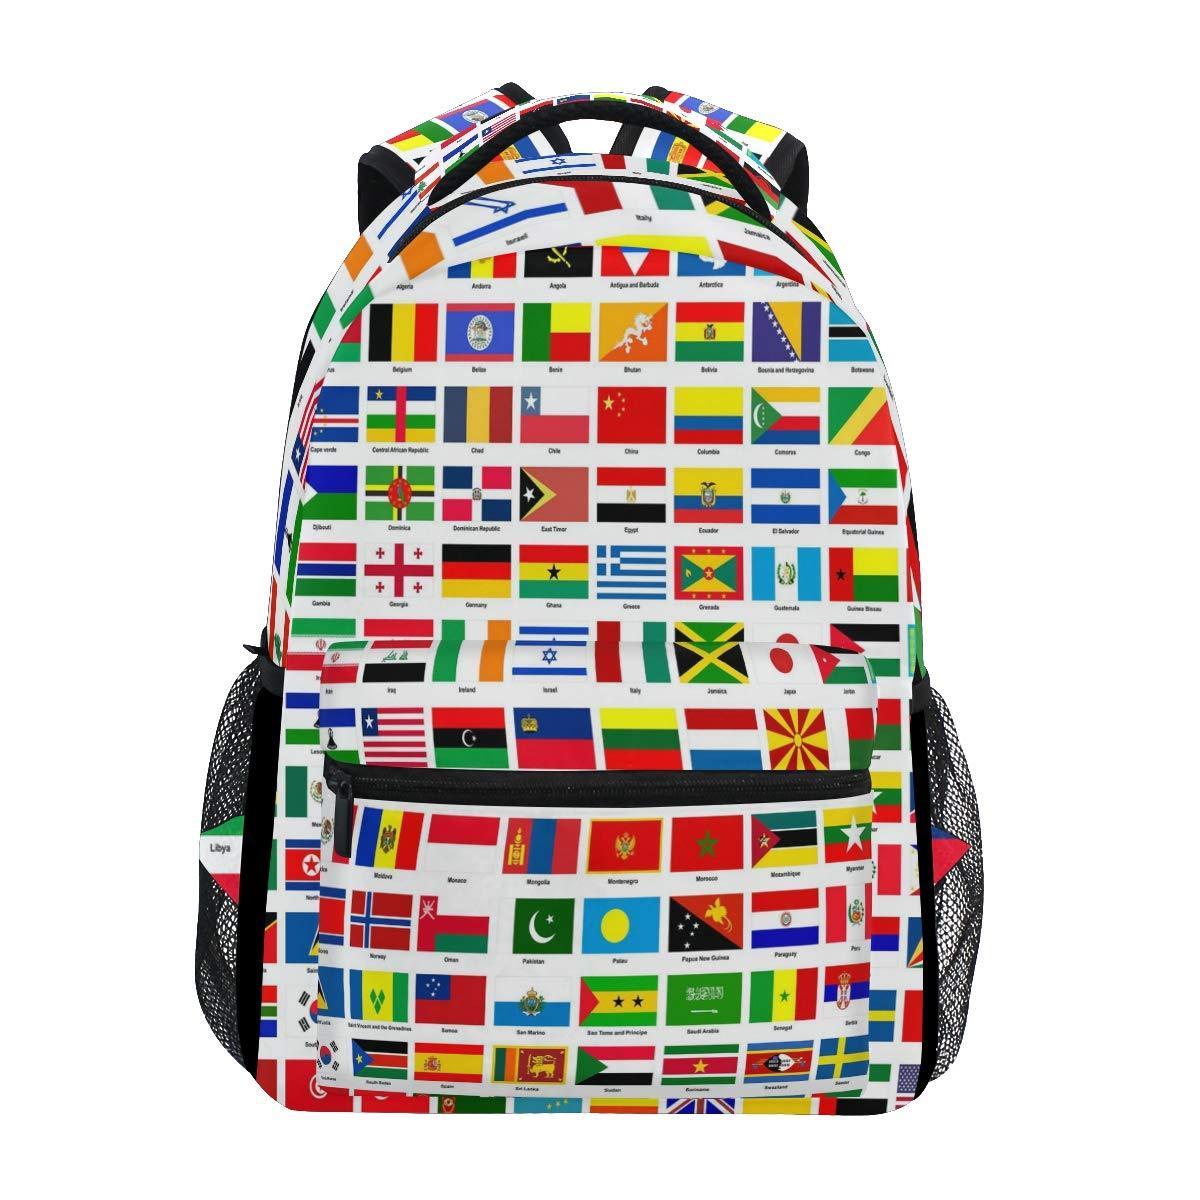 WXLIFE Education World Country Flag Backpack Travel School Shoulder Bag for Kids Boys Girls Women Men